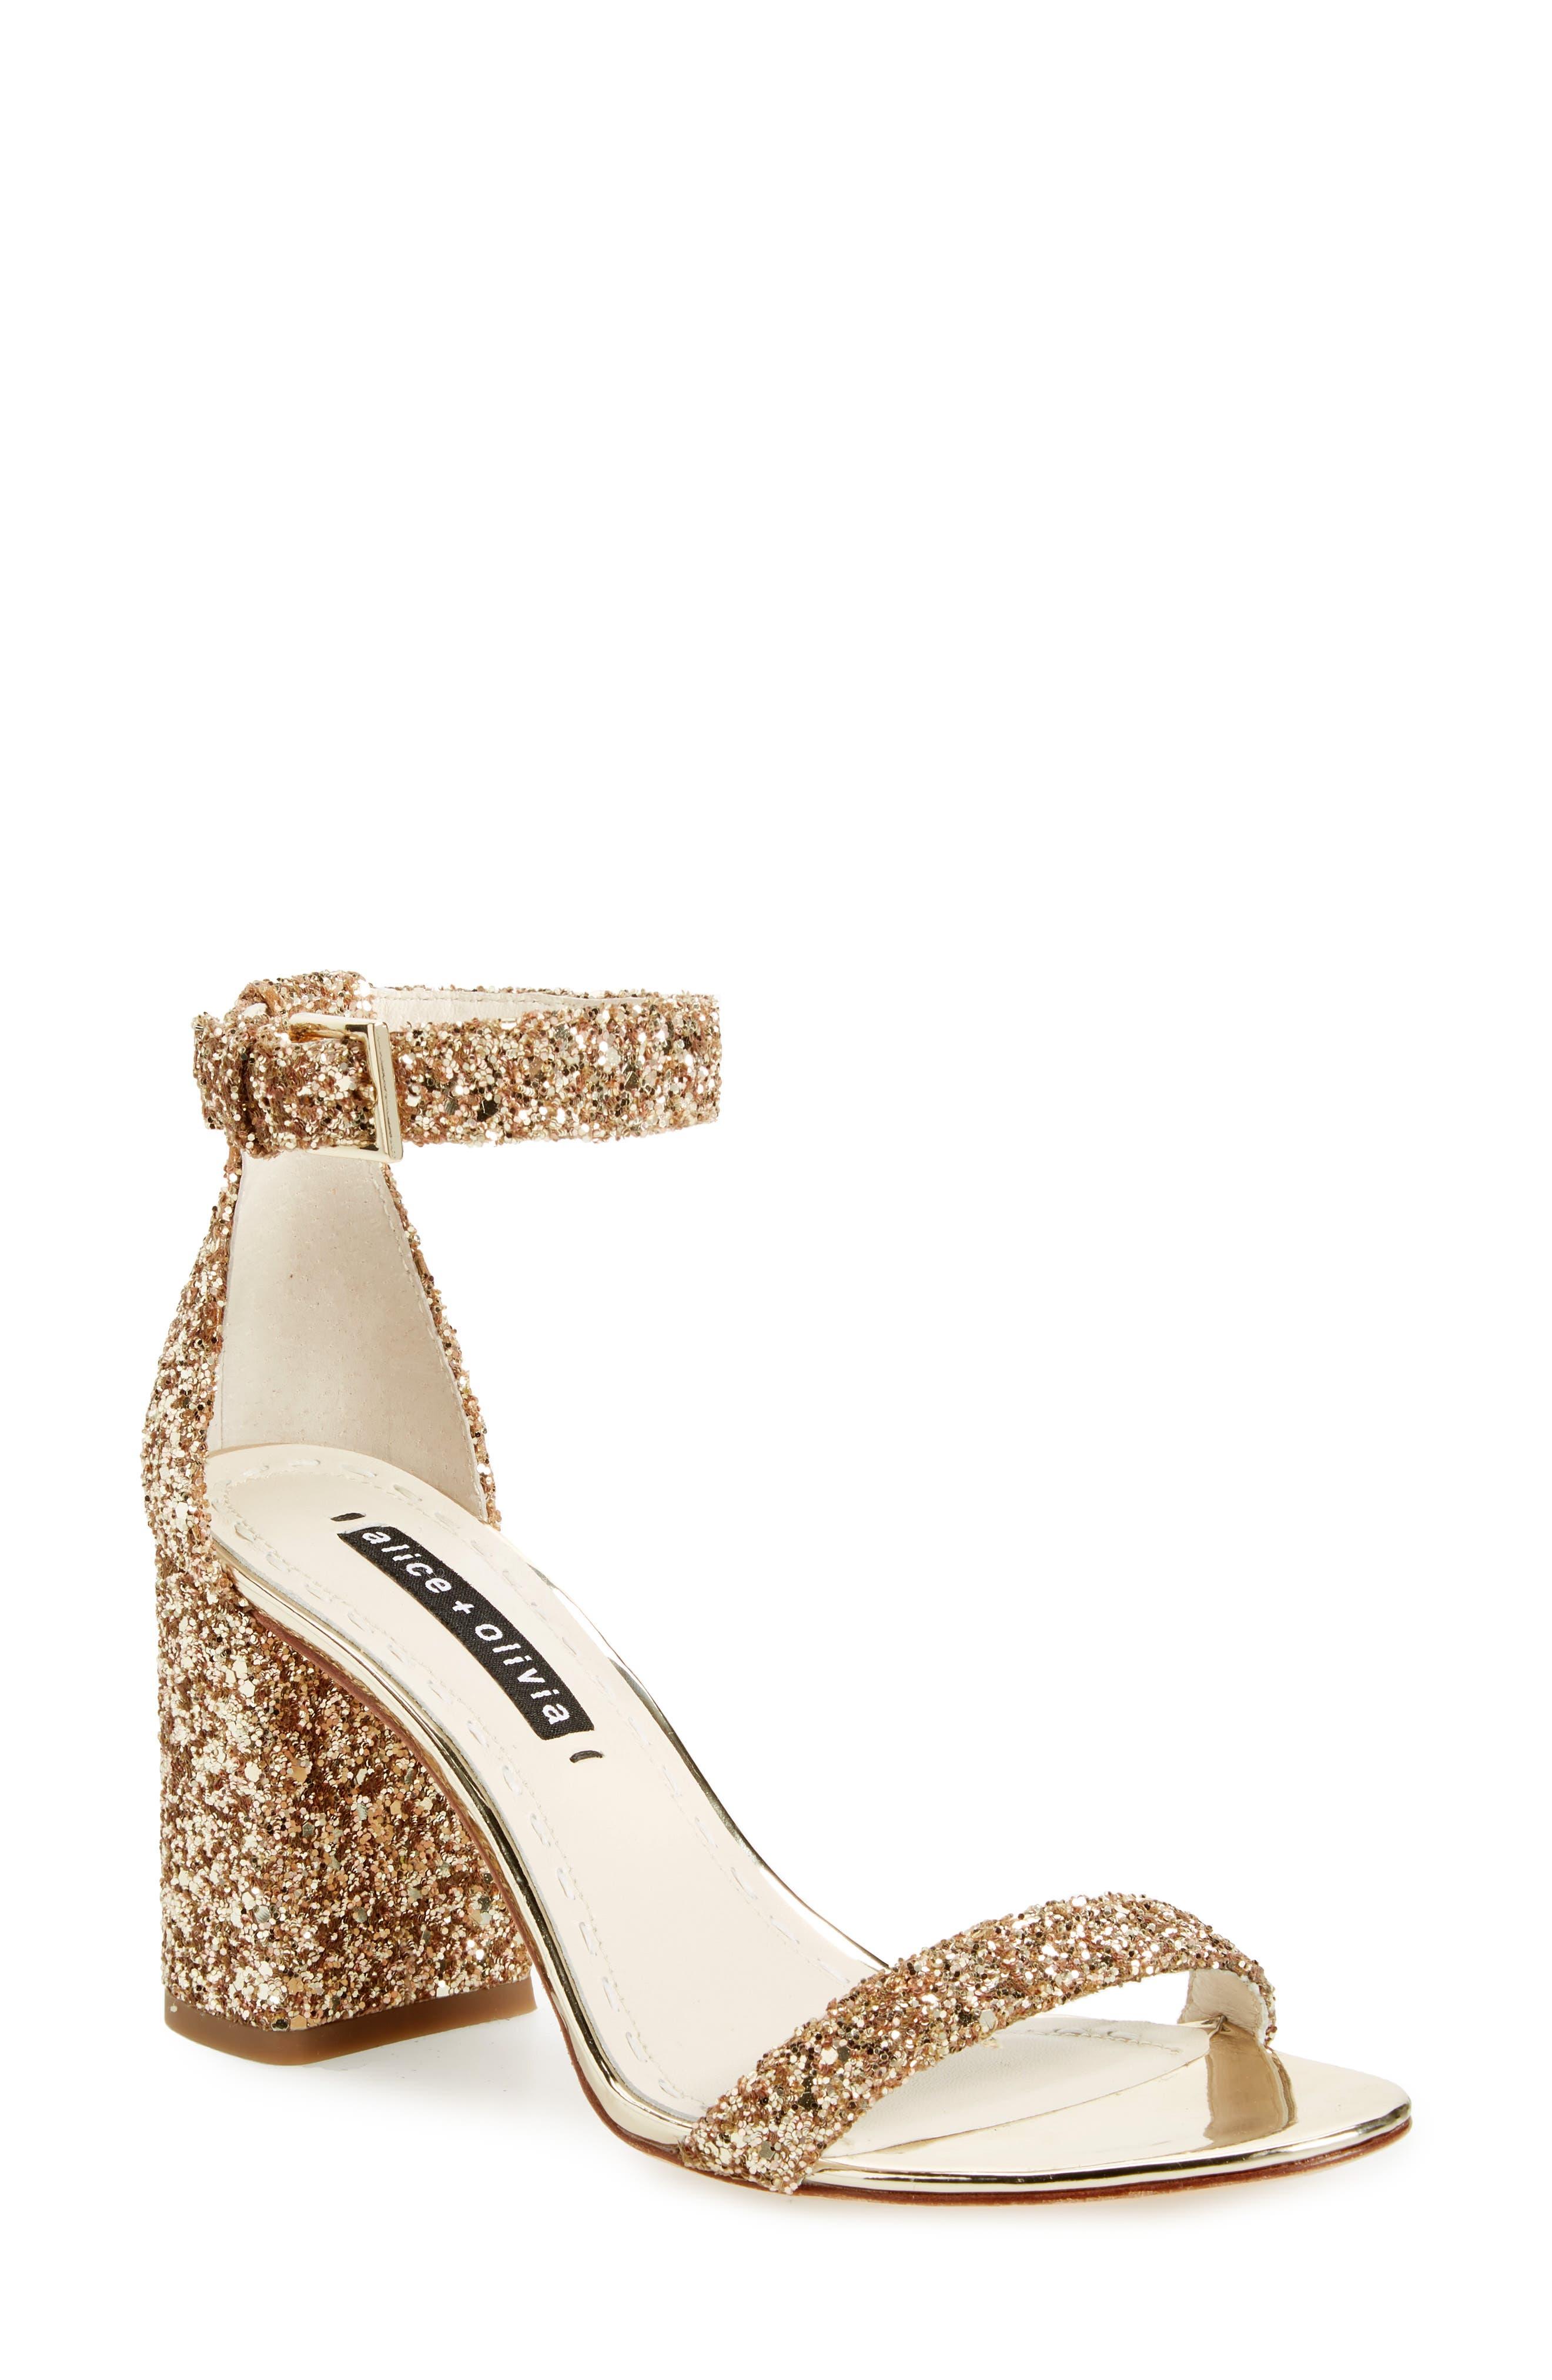 Lillian Glitter Ankle Strap Sandal,                         Main,                         color, Gold